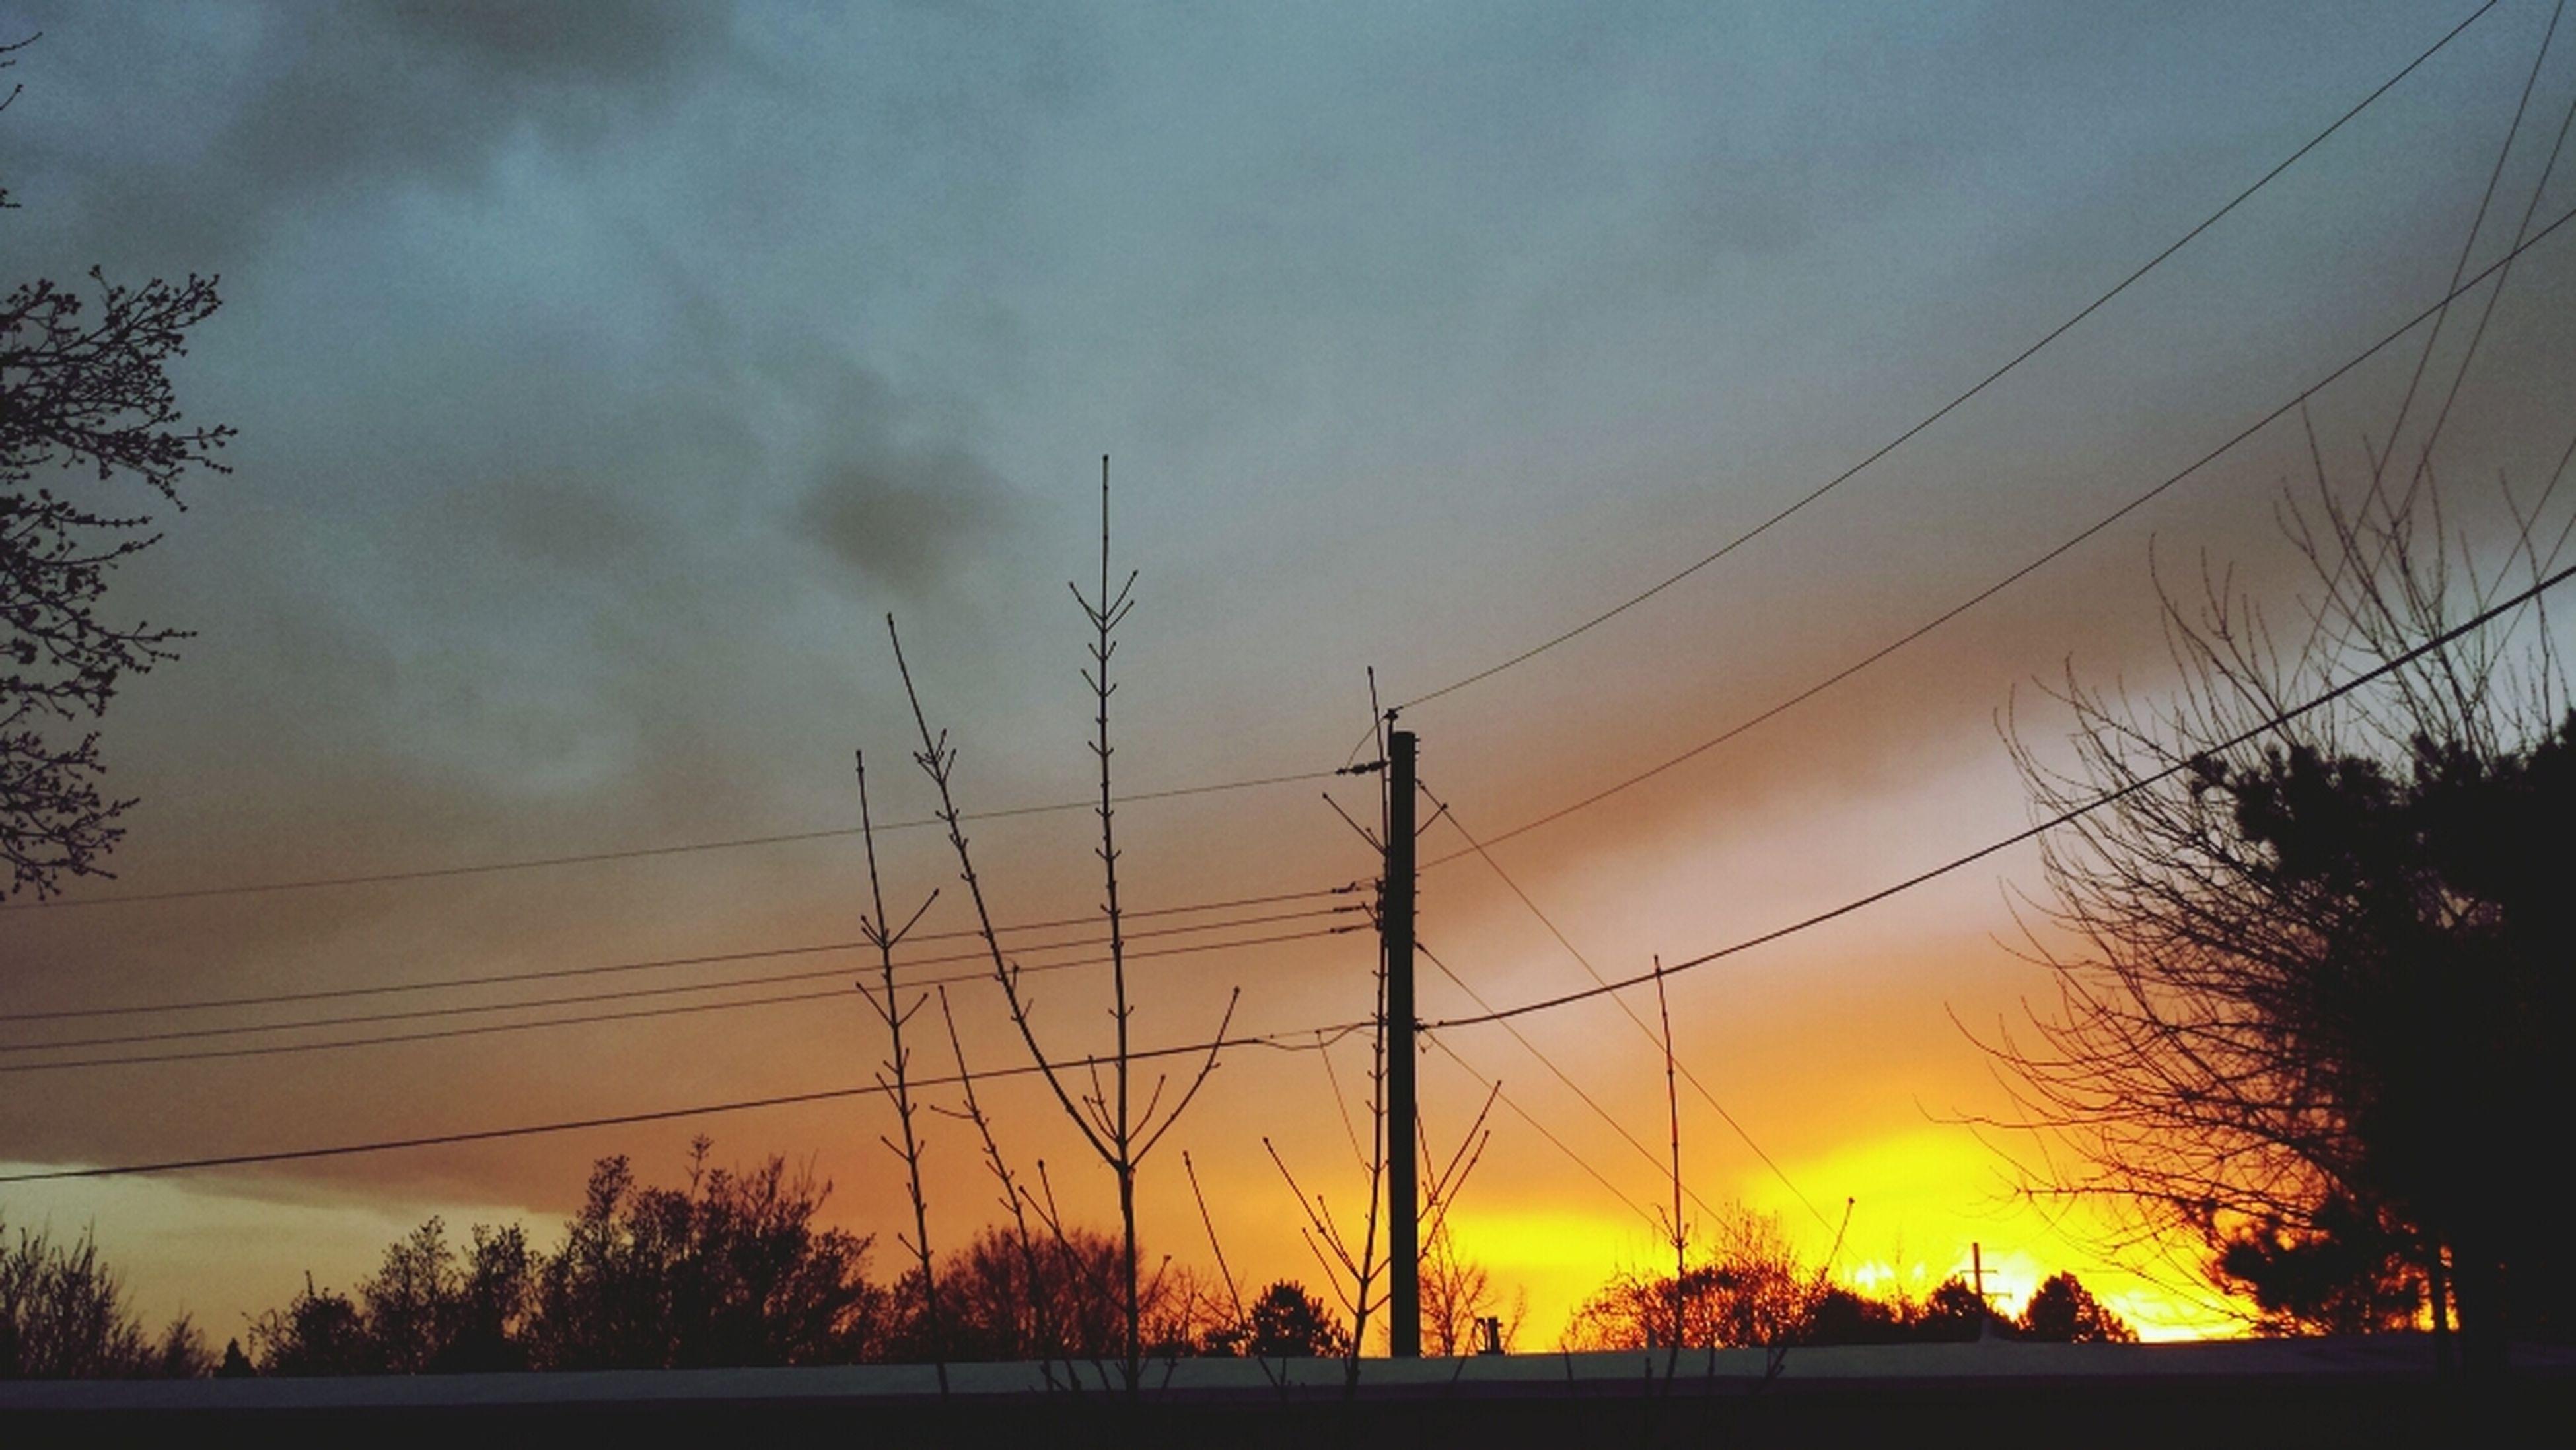 sunset, silhouette, orange color, sky, scenics, beauty in nature, tranquility, tranquil scene, nature, tree, dramatic sky, power line, idyllic, cloud - sky, sun, electricity pylon, moody sky, majestic, cloud, outdoors